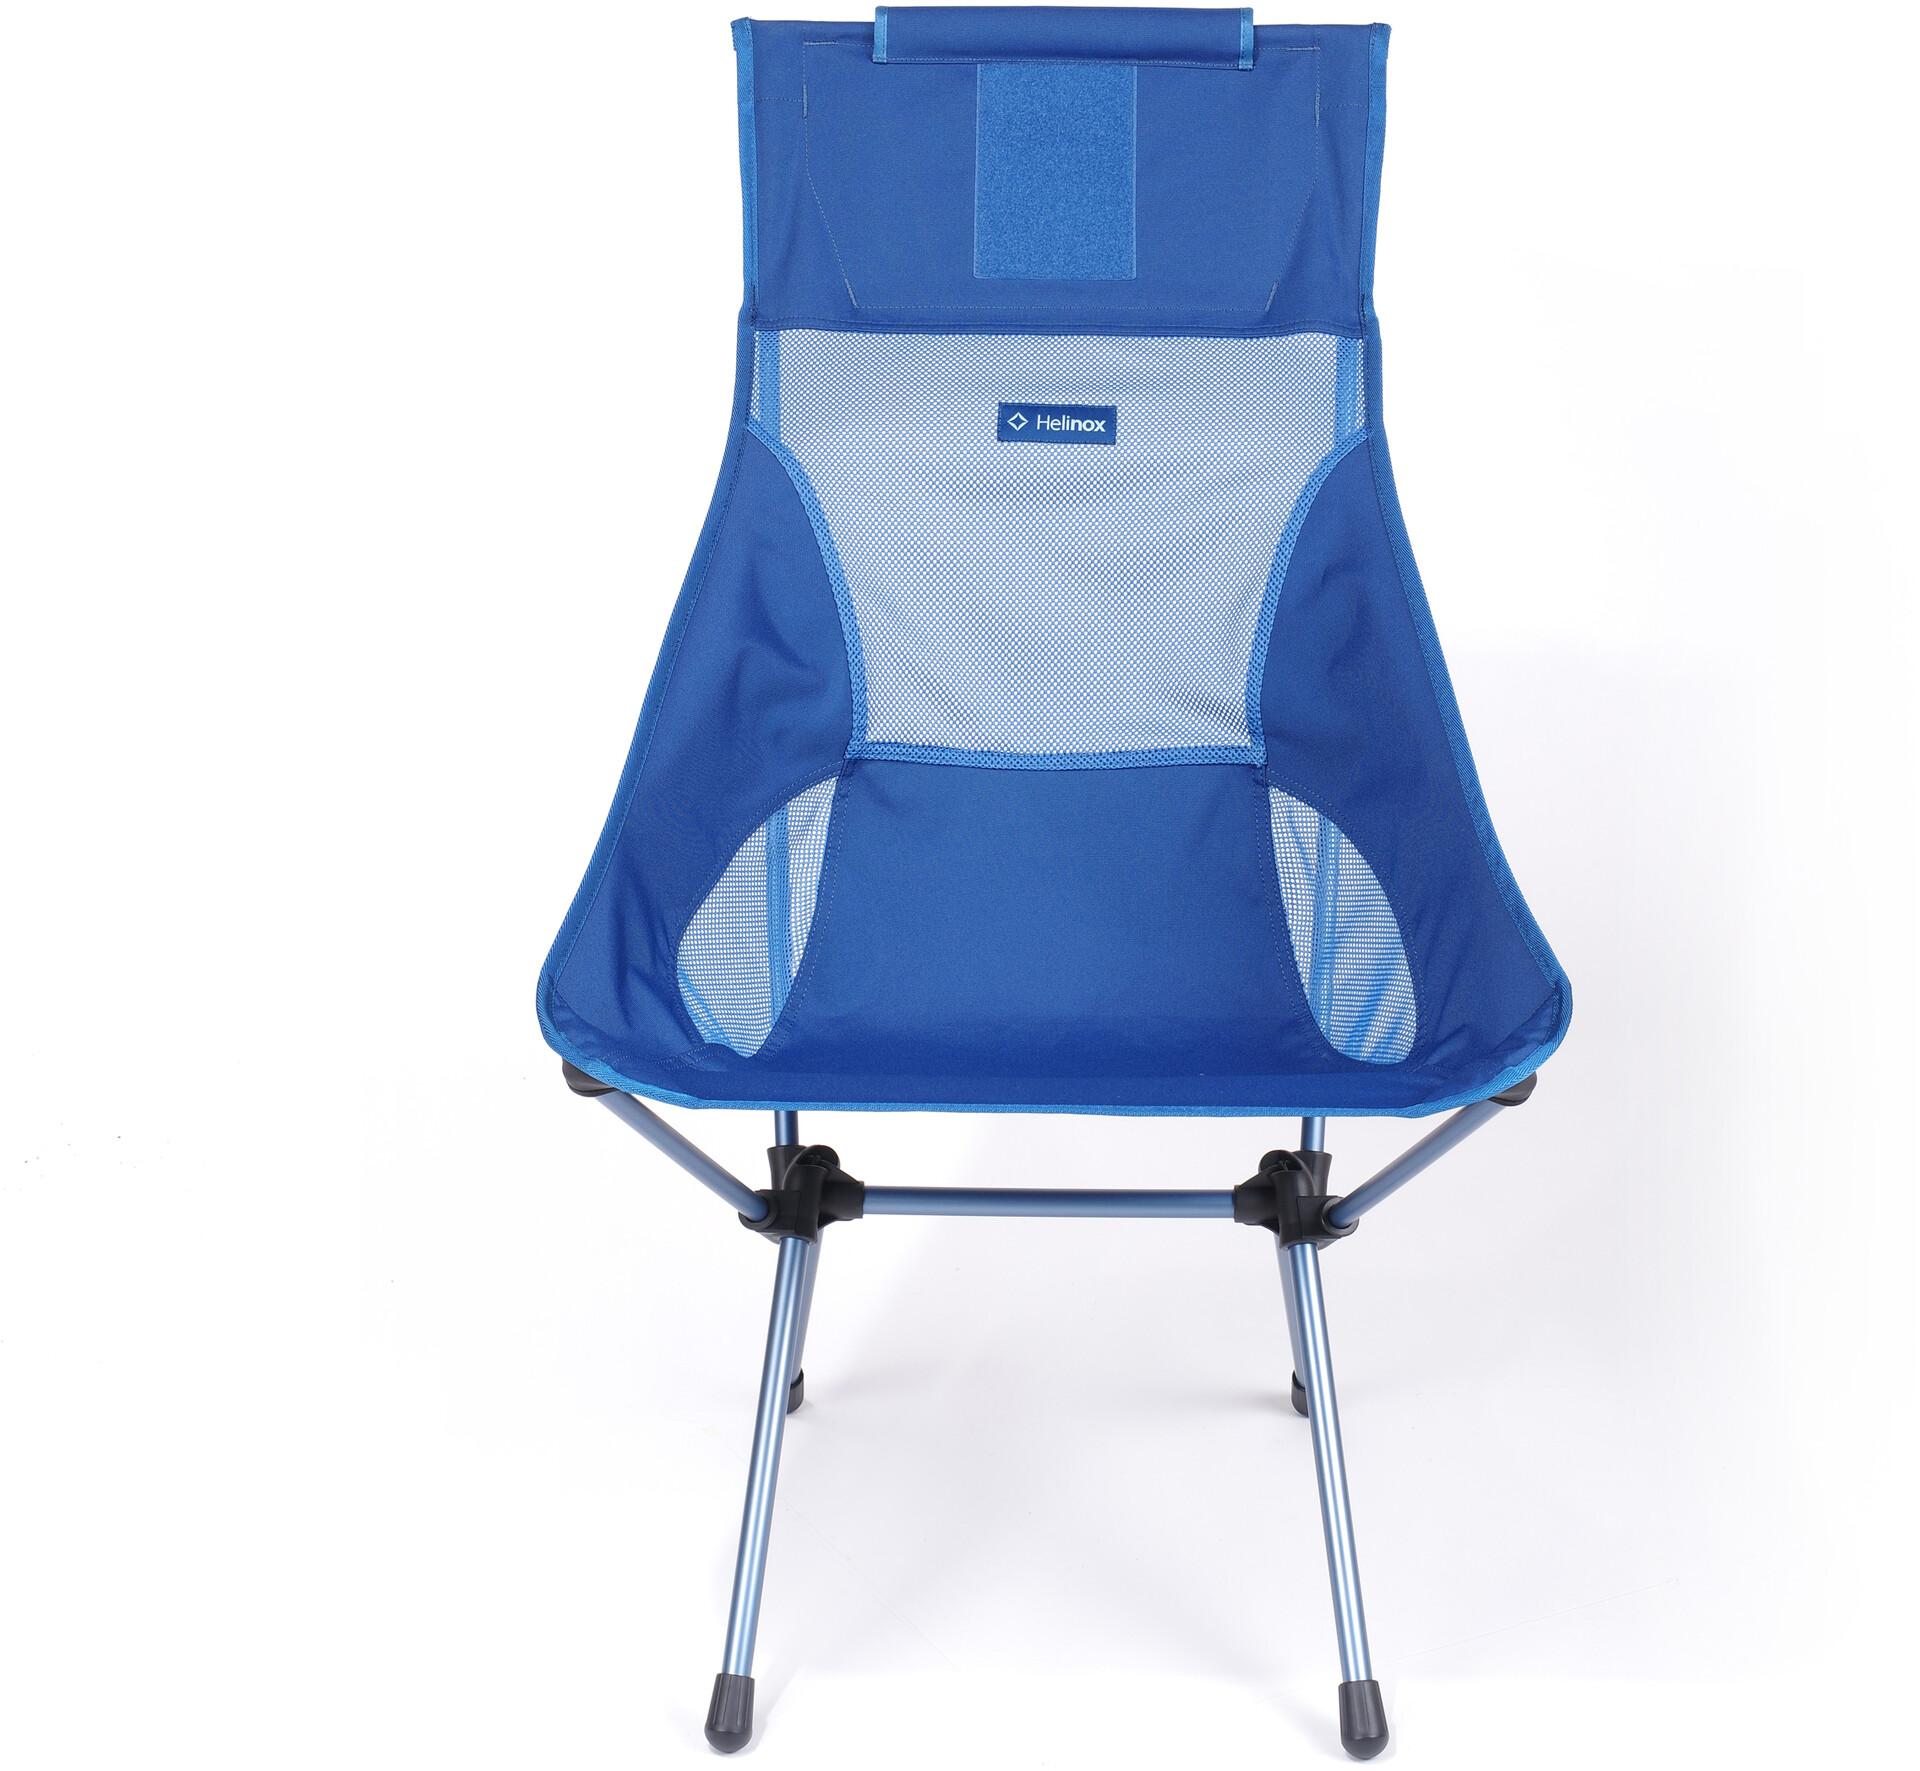 Helinox Sunset Chaise, blue blocknavy